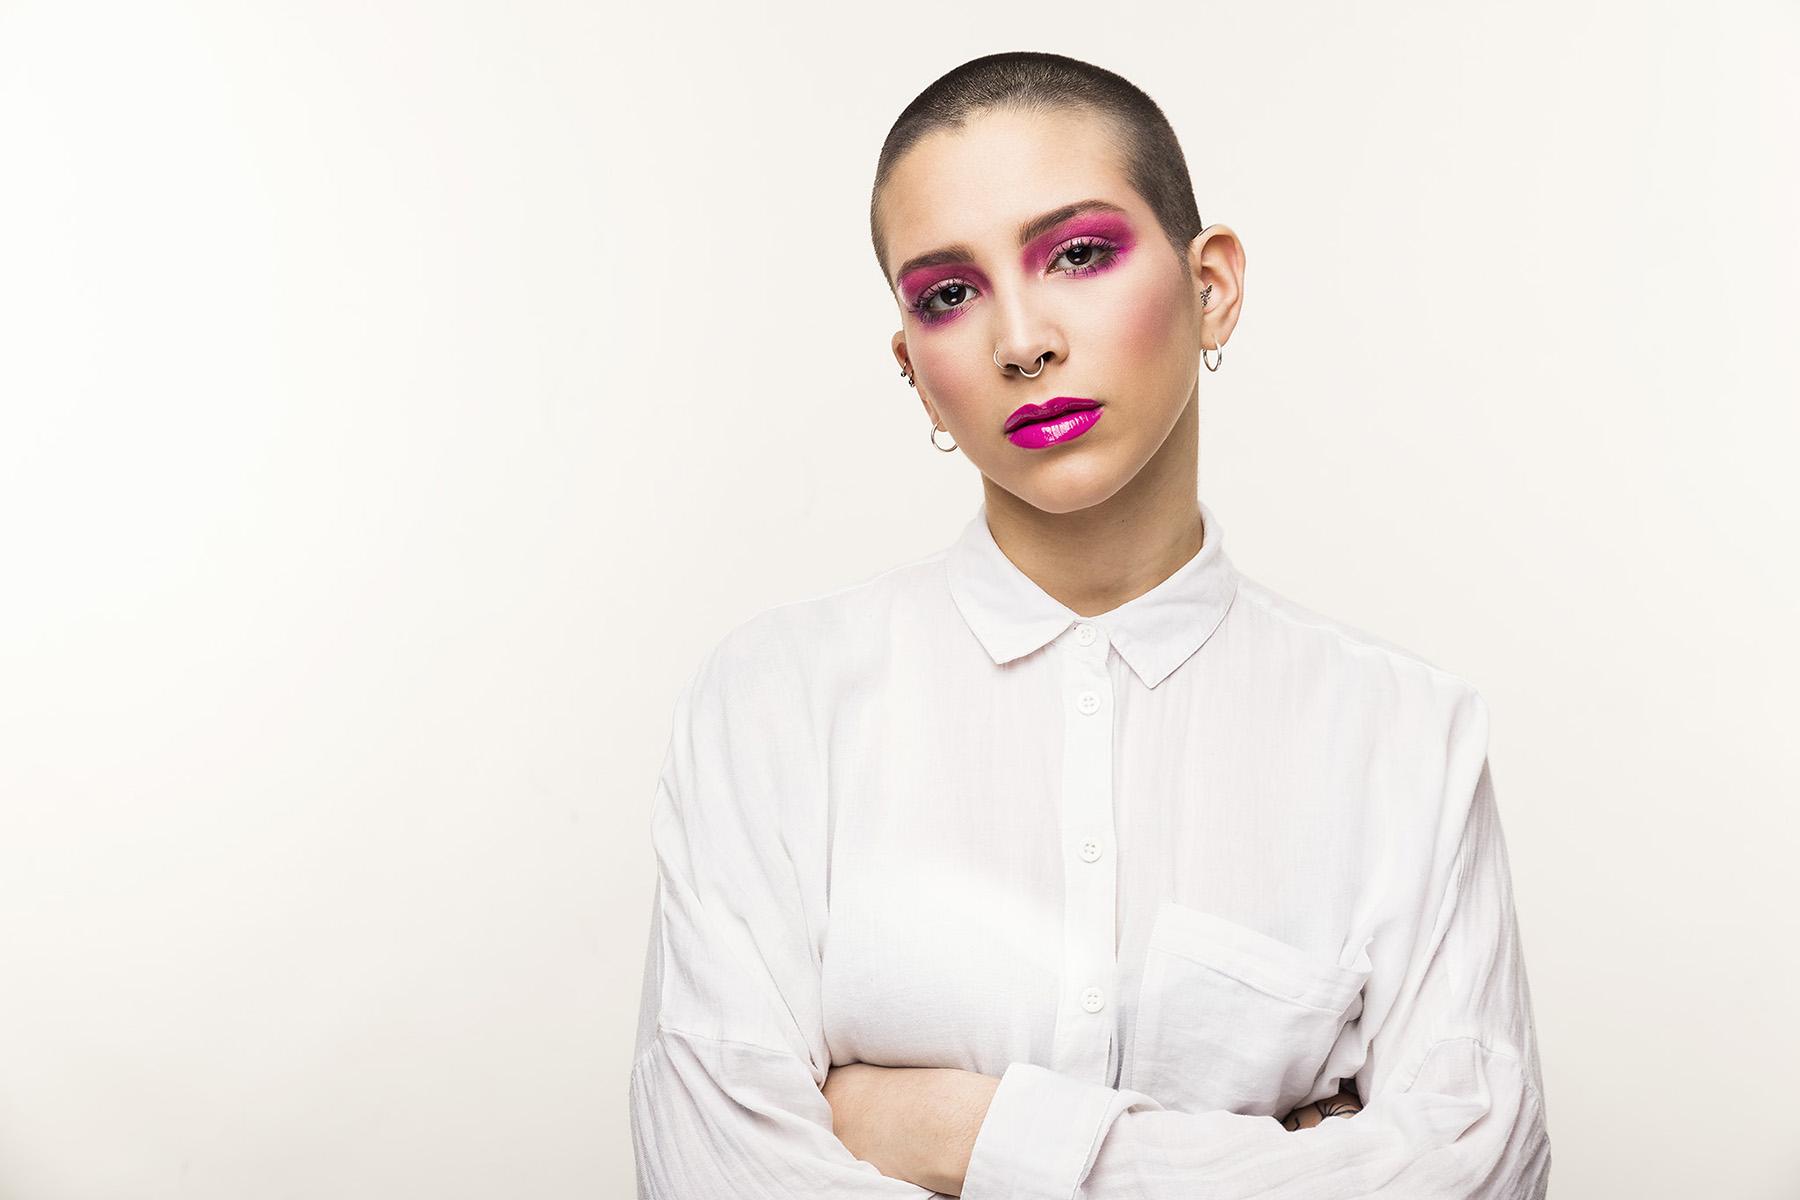 starkes Makeup pink Lippenstift Portrait Studiofotografie weiße Bluse